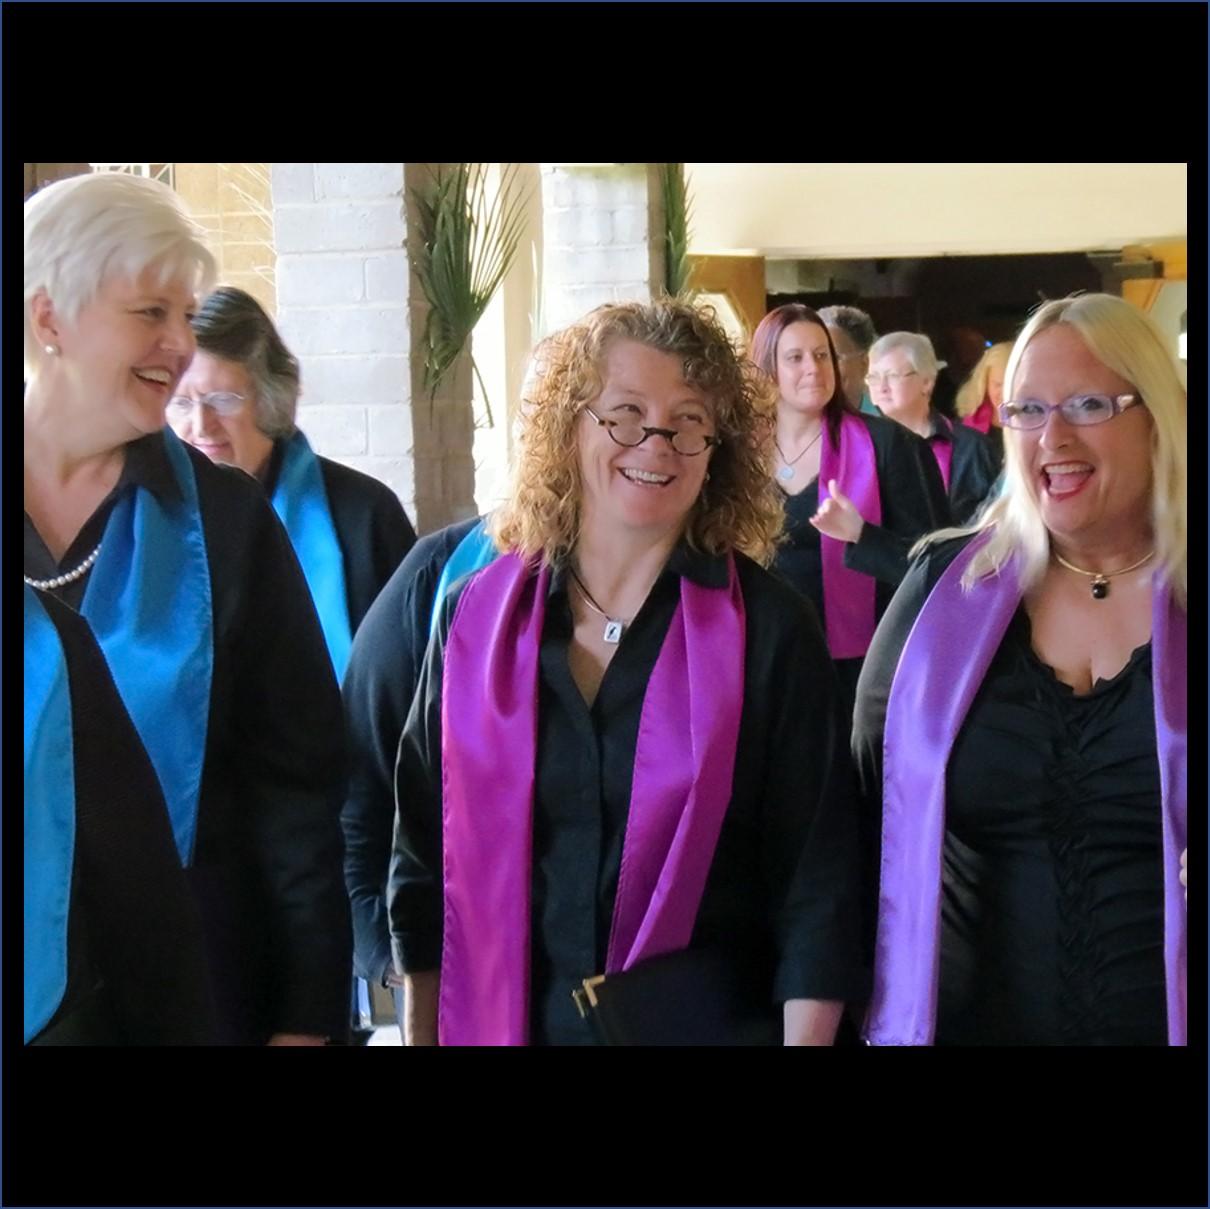 Phoenix Women Chorus Singers heading to the stage.